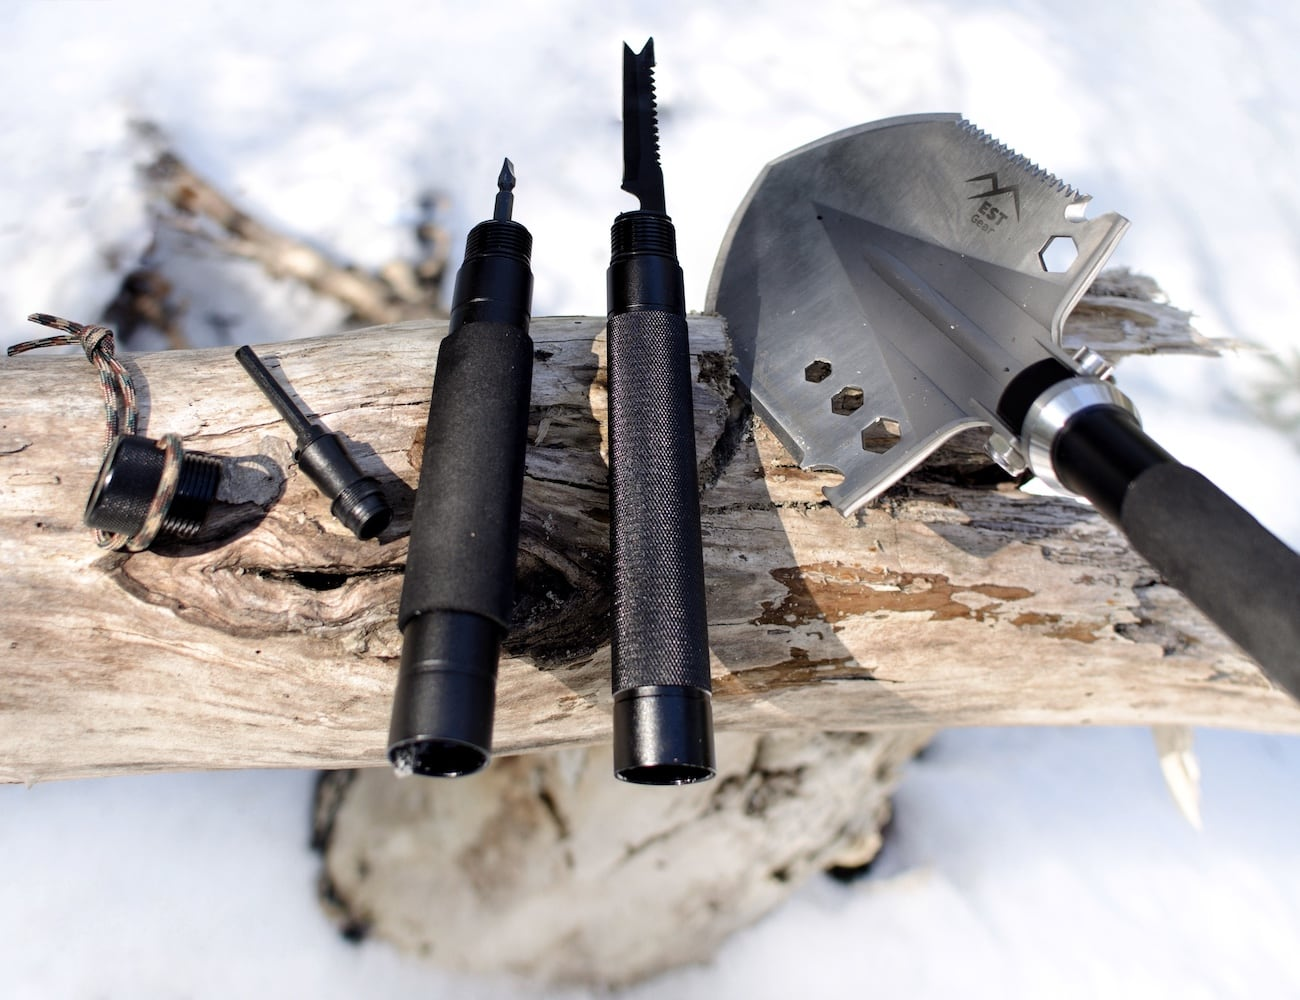 EST Shovel Multipurpose Adventure Tool combines 18 useful features in one